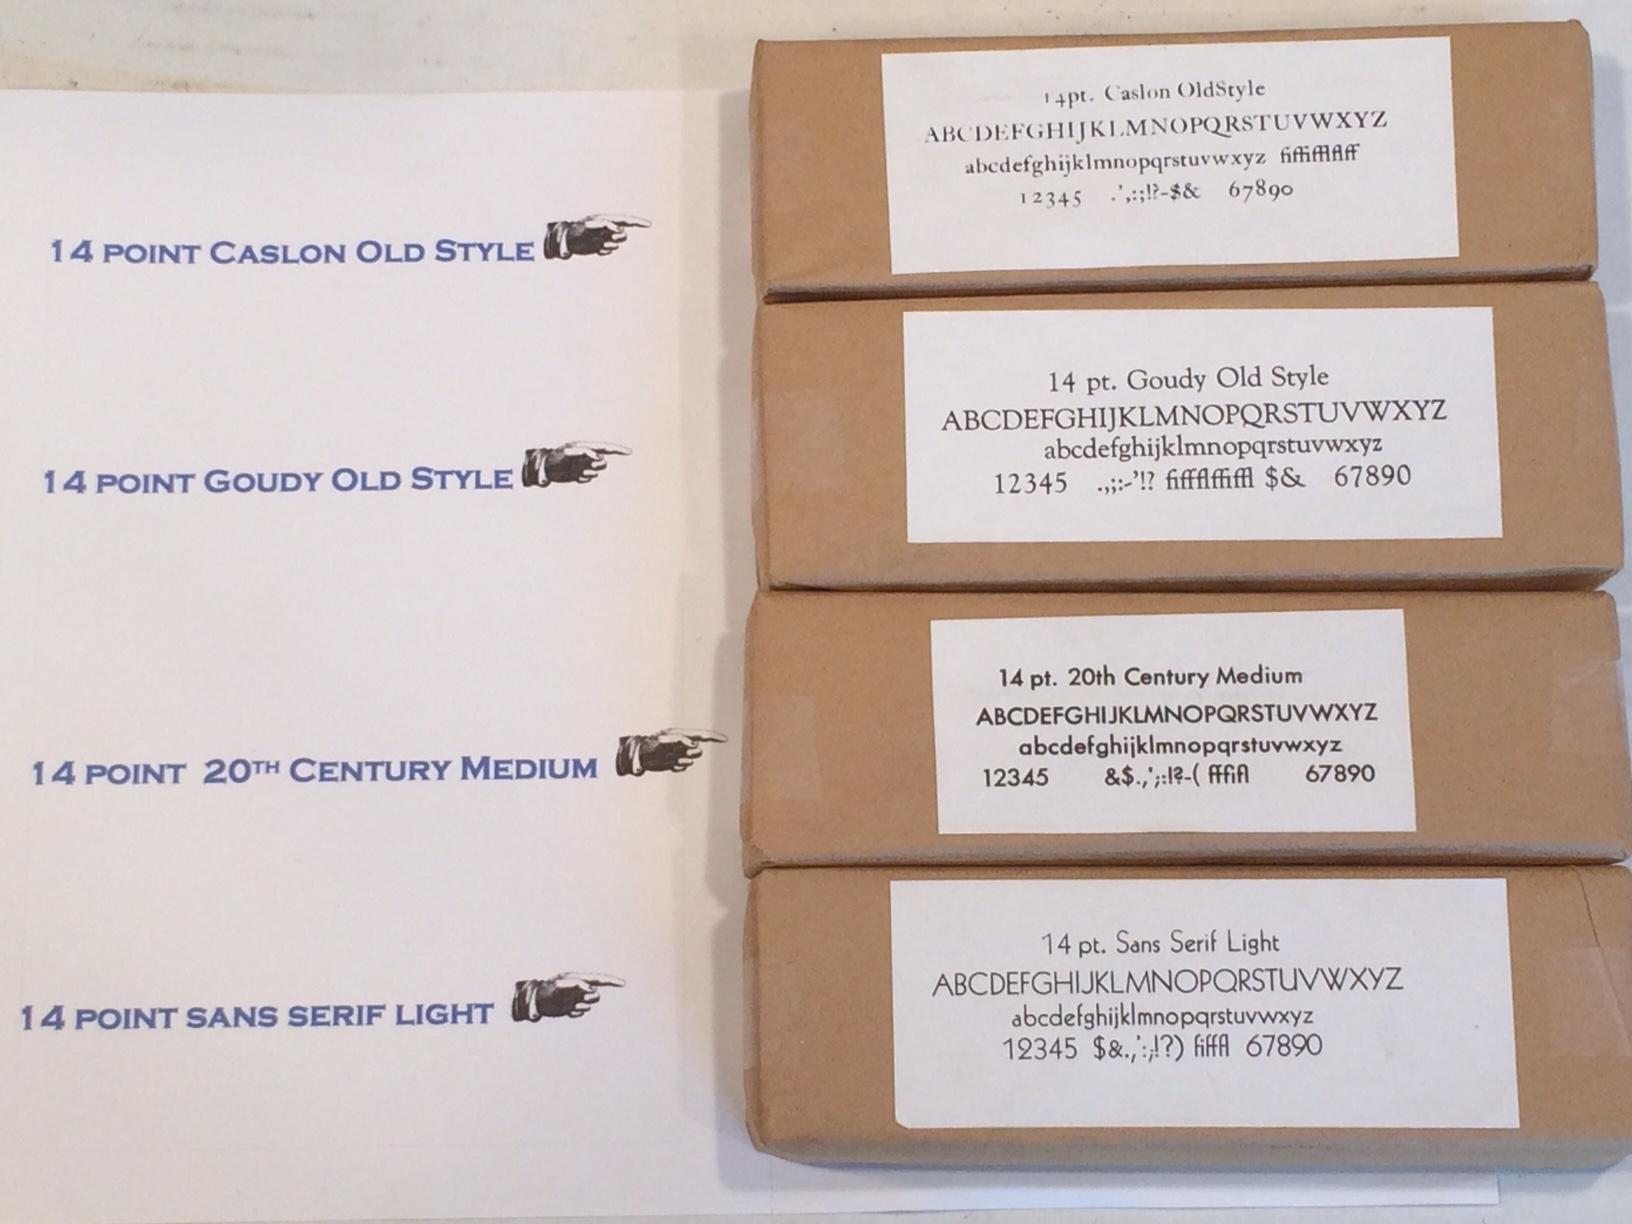 Additional Fonts: 14 point Caslon, Goudy, 20th Century Medium & Sans Serif  Light